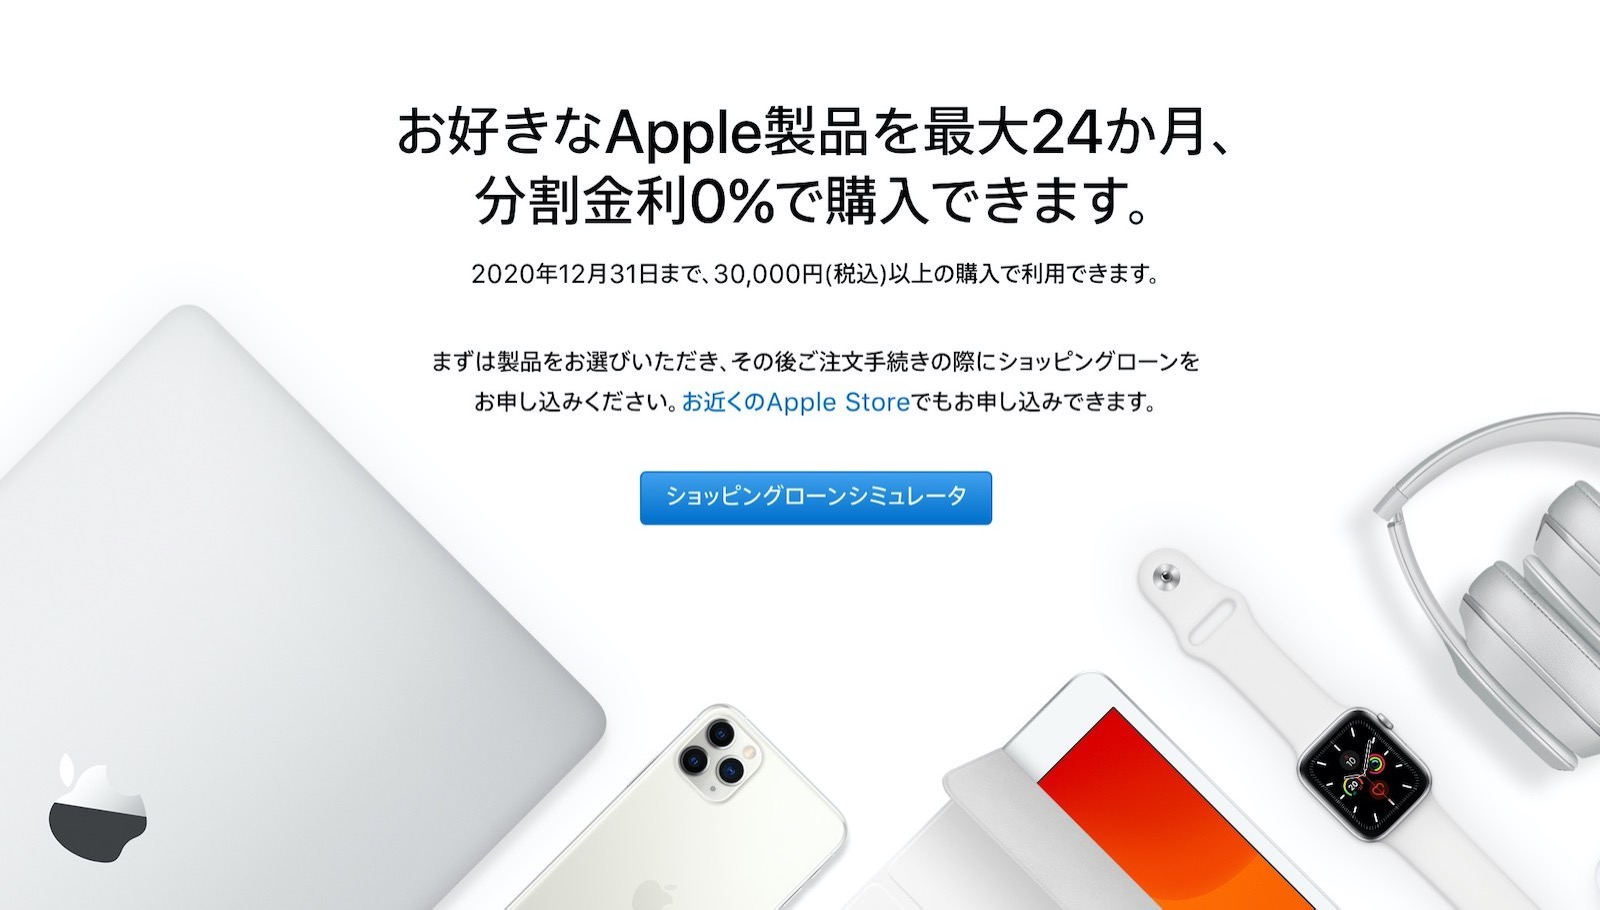 Apple Shopping Loan Financing